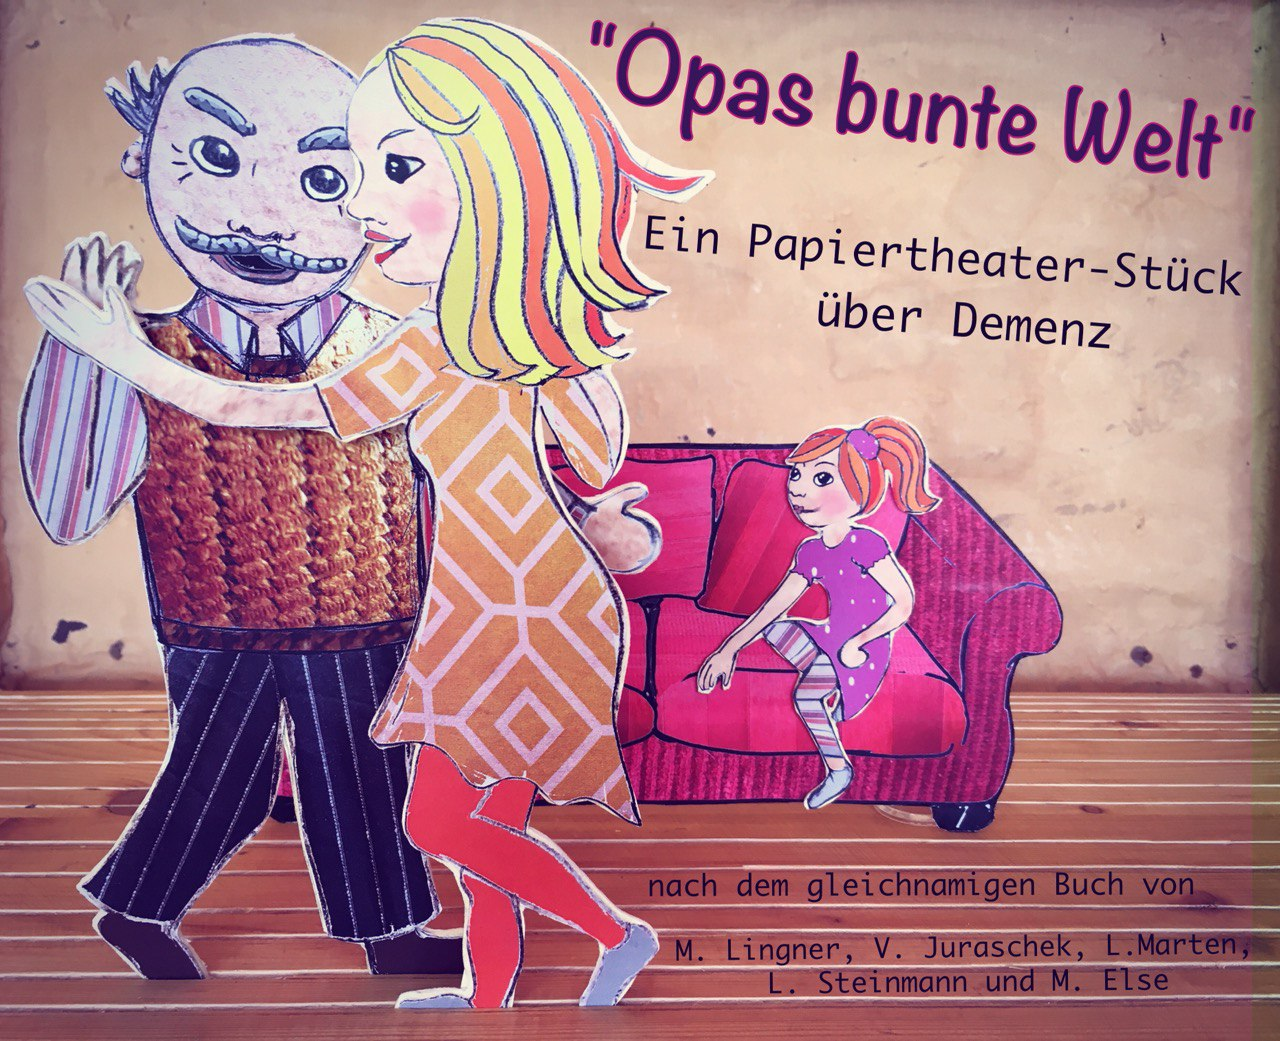 Papiertheater - Opas bunte Welt - Birgit Klinksieck- Wilmas Theater Welt